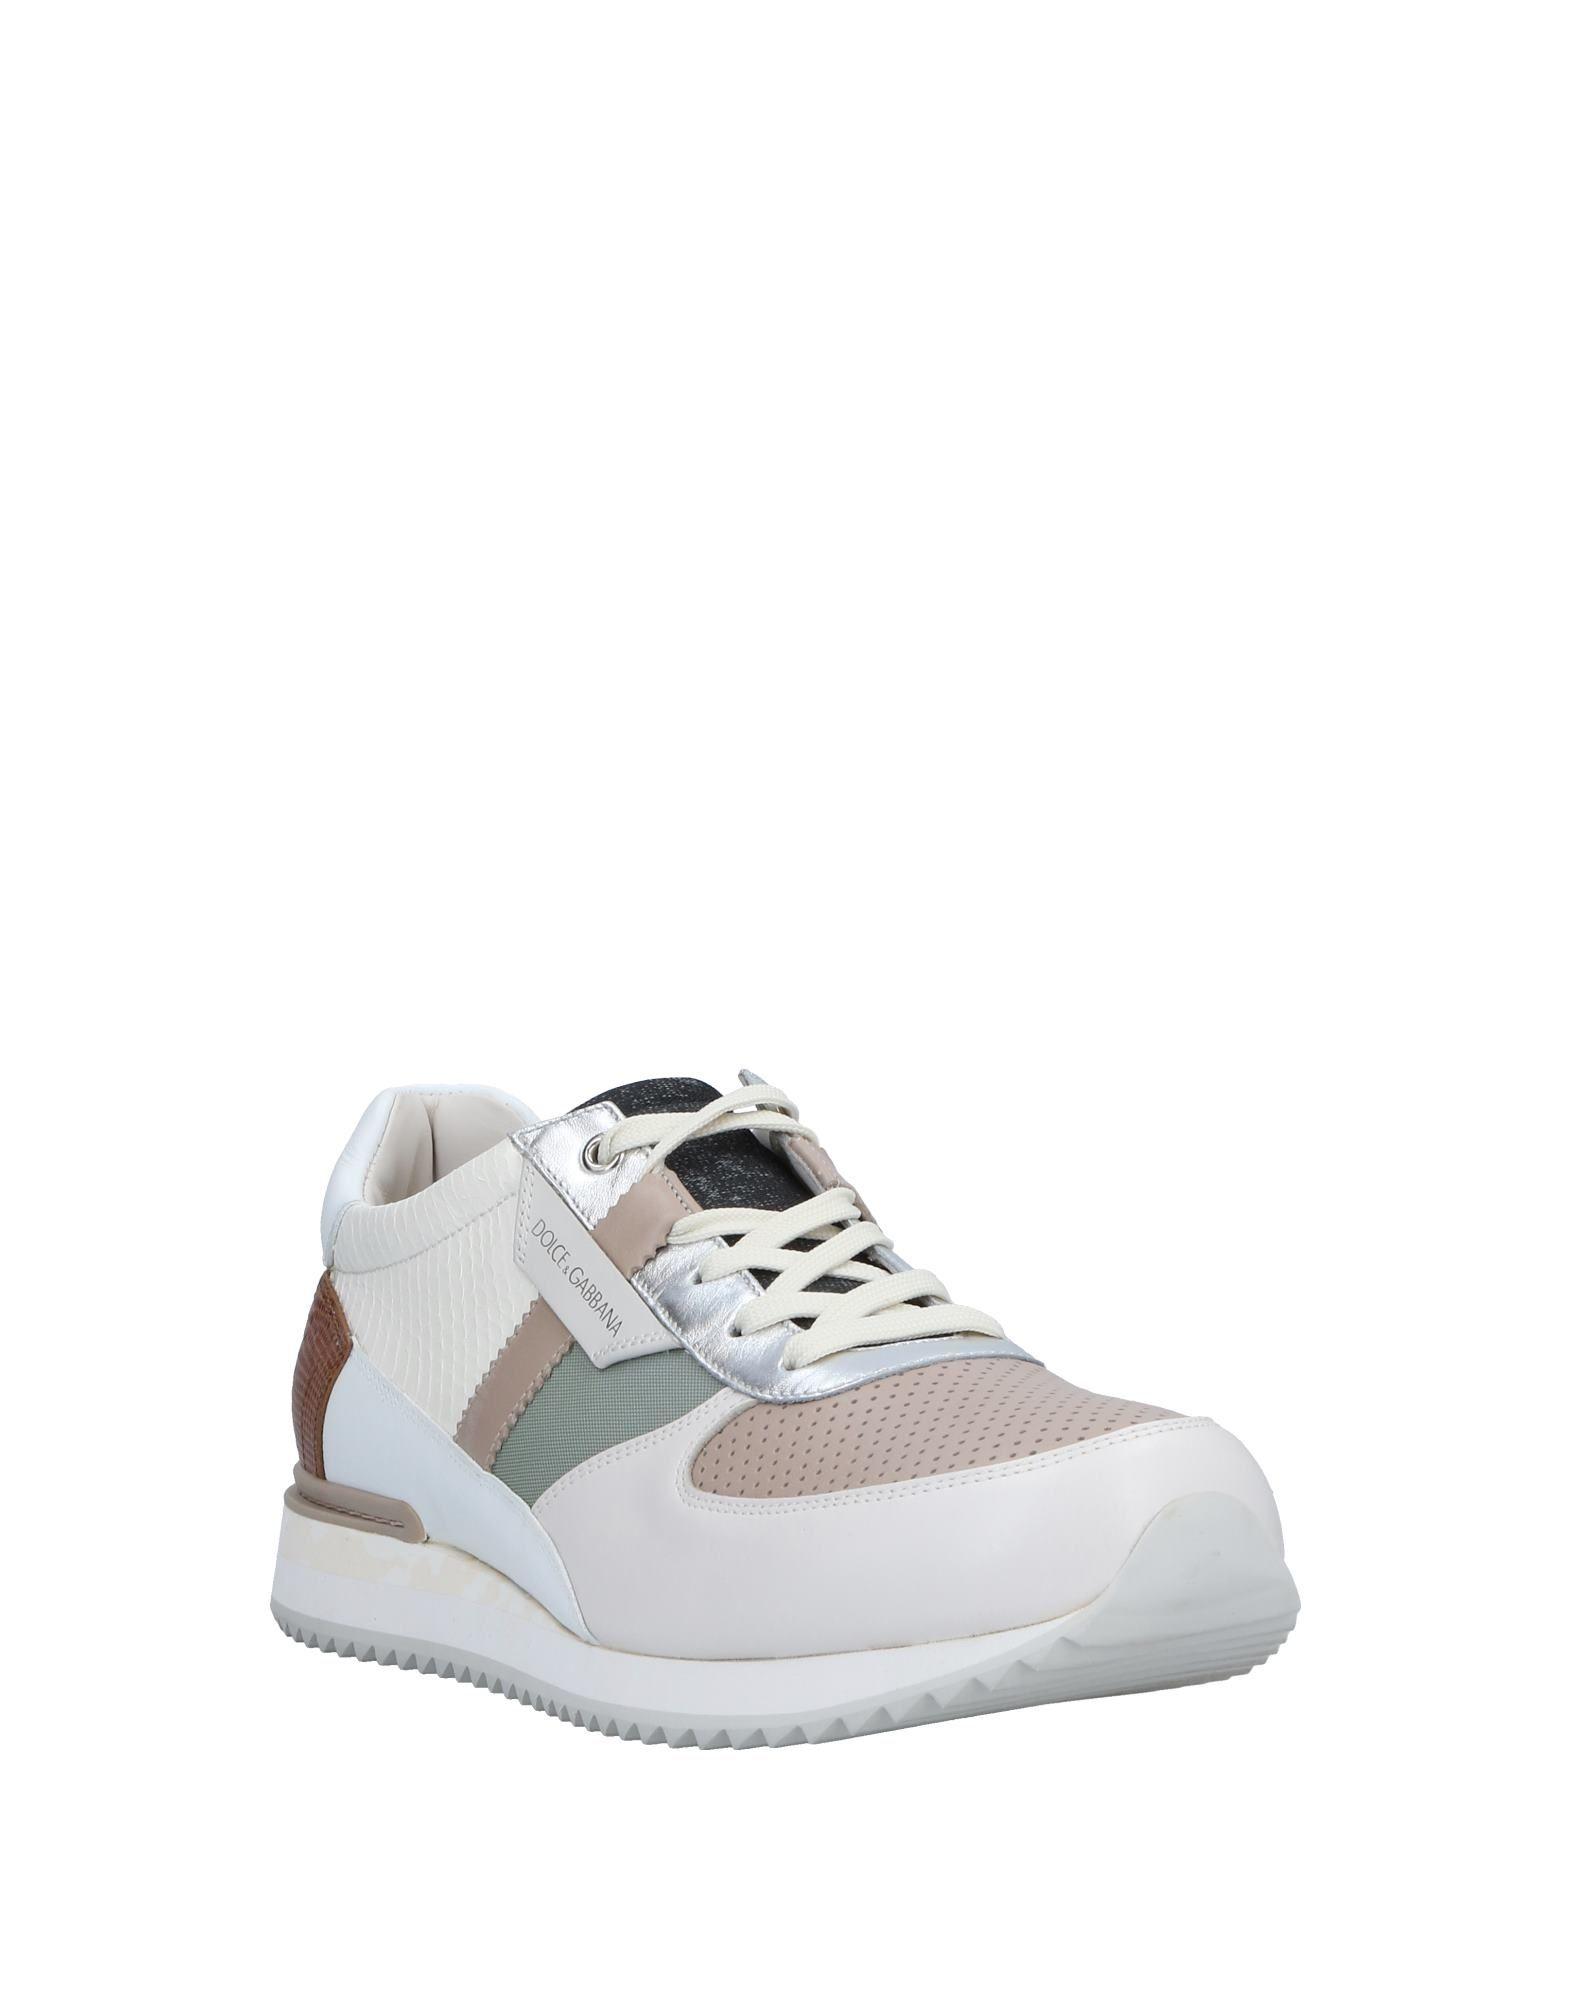 Dolce  & Gabbana Sneakers Herren  Dolce 11523172AQ  ce7d2a